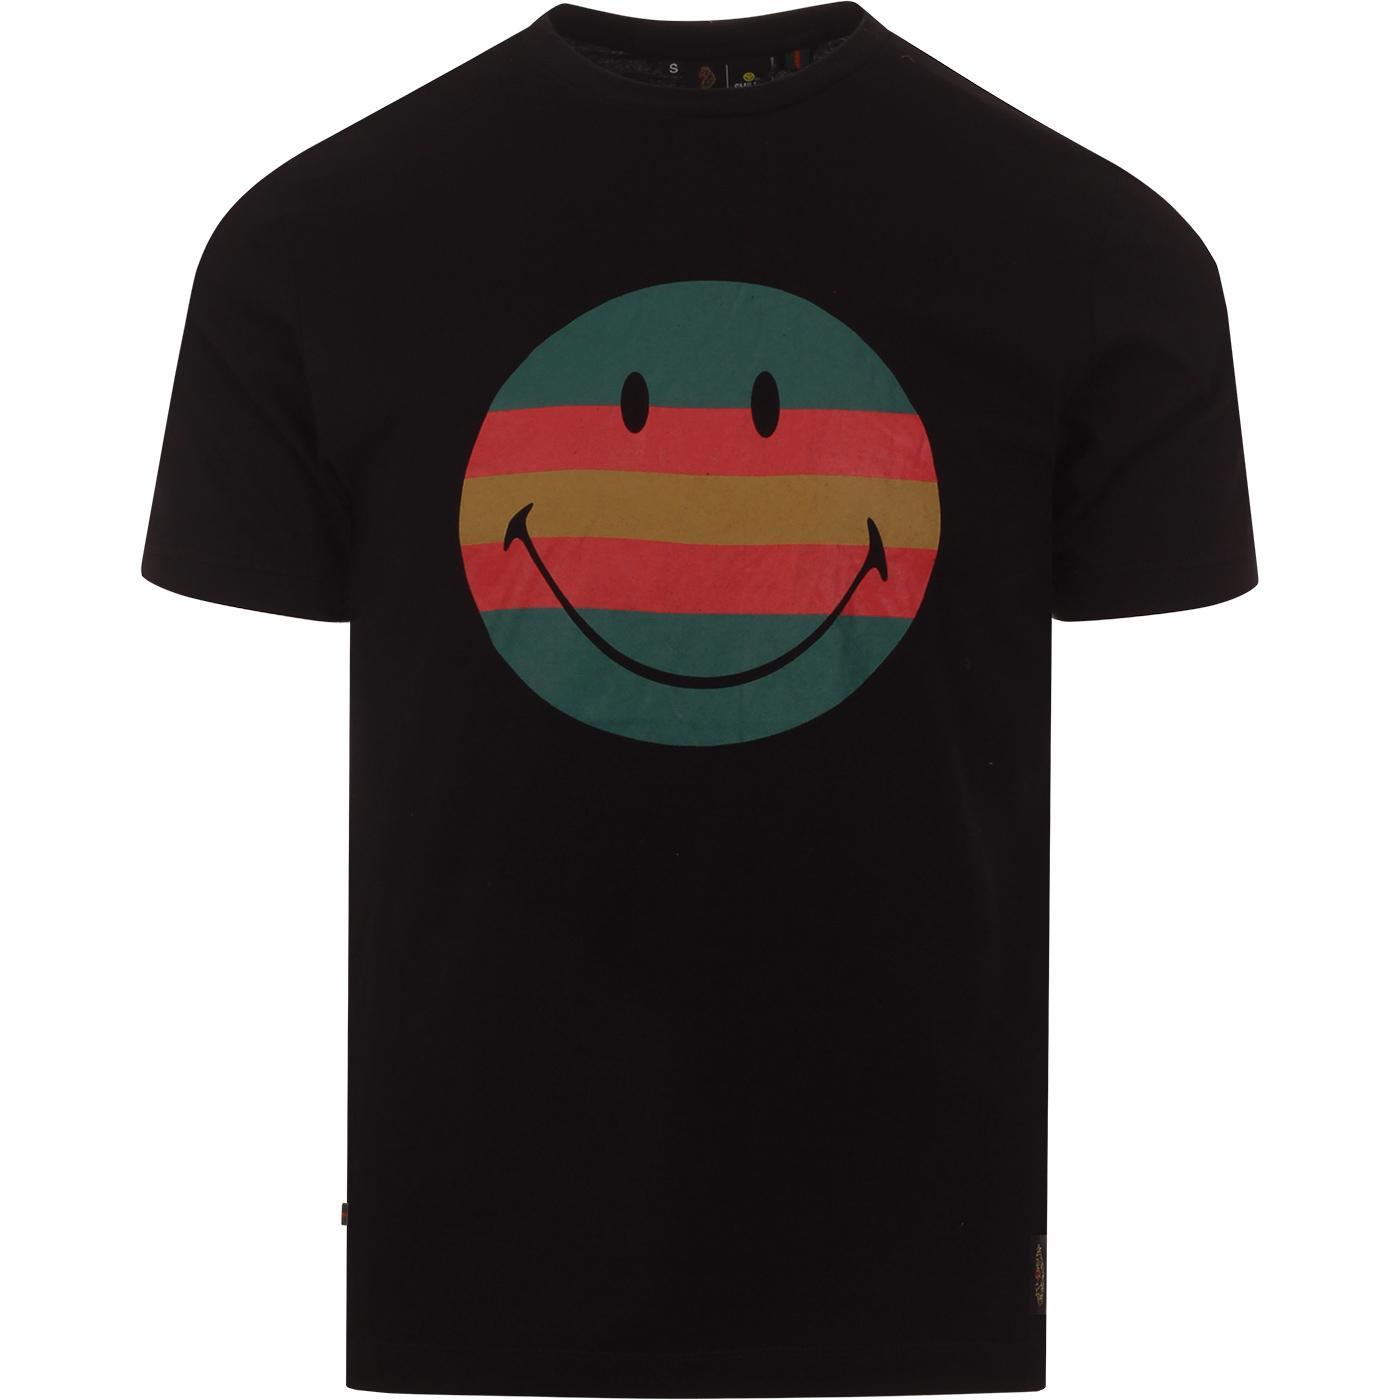 LUKE x SMILEY Vibes Retro Stripe Rave Tee (Black)